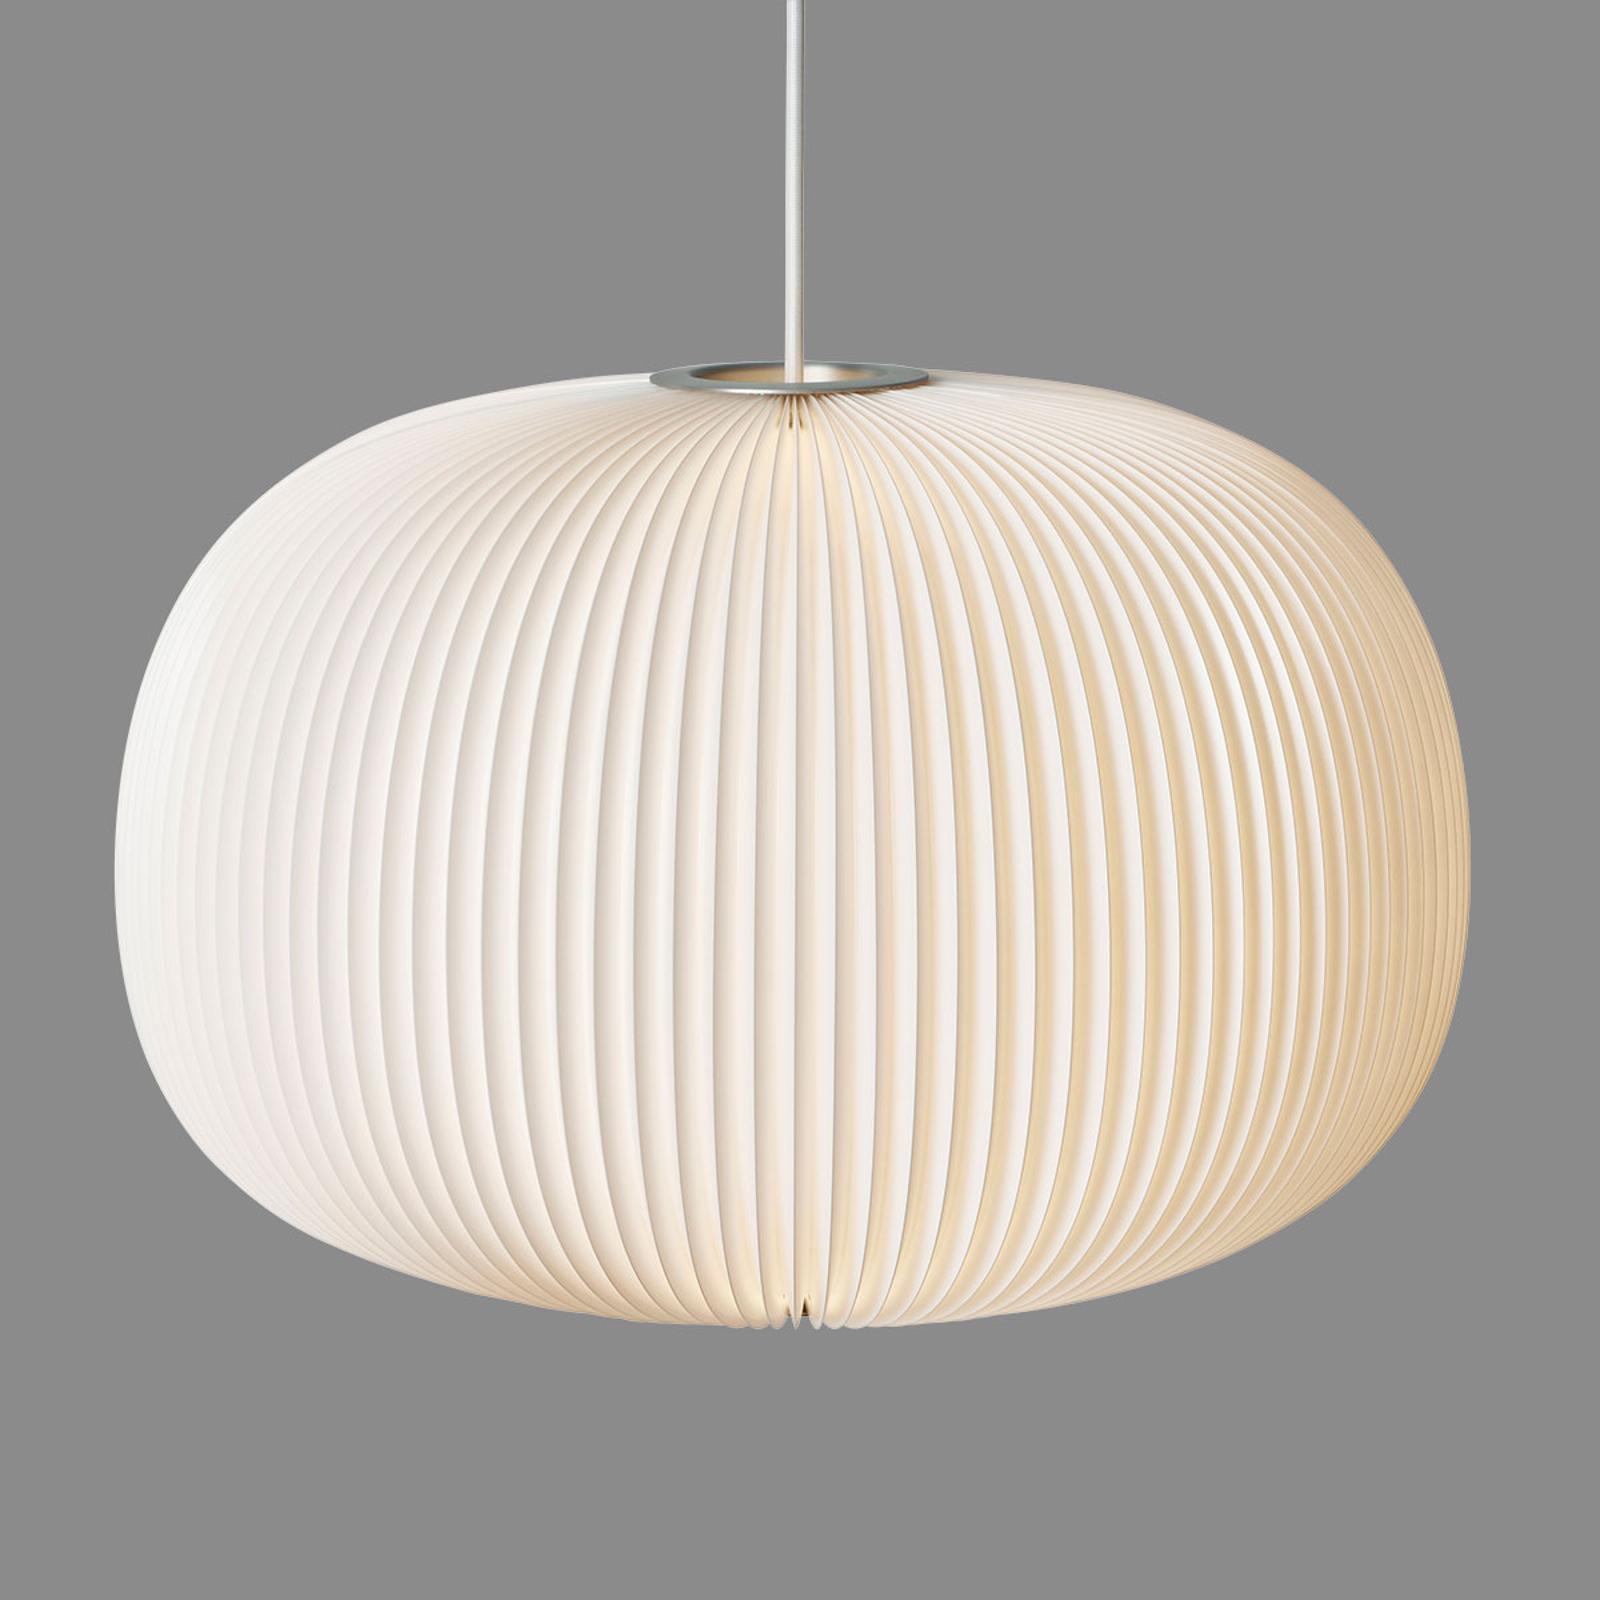 LE KLINT Lamella 1 - design-hanglamp, alu